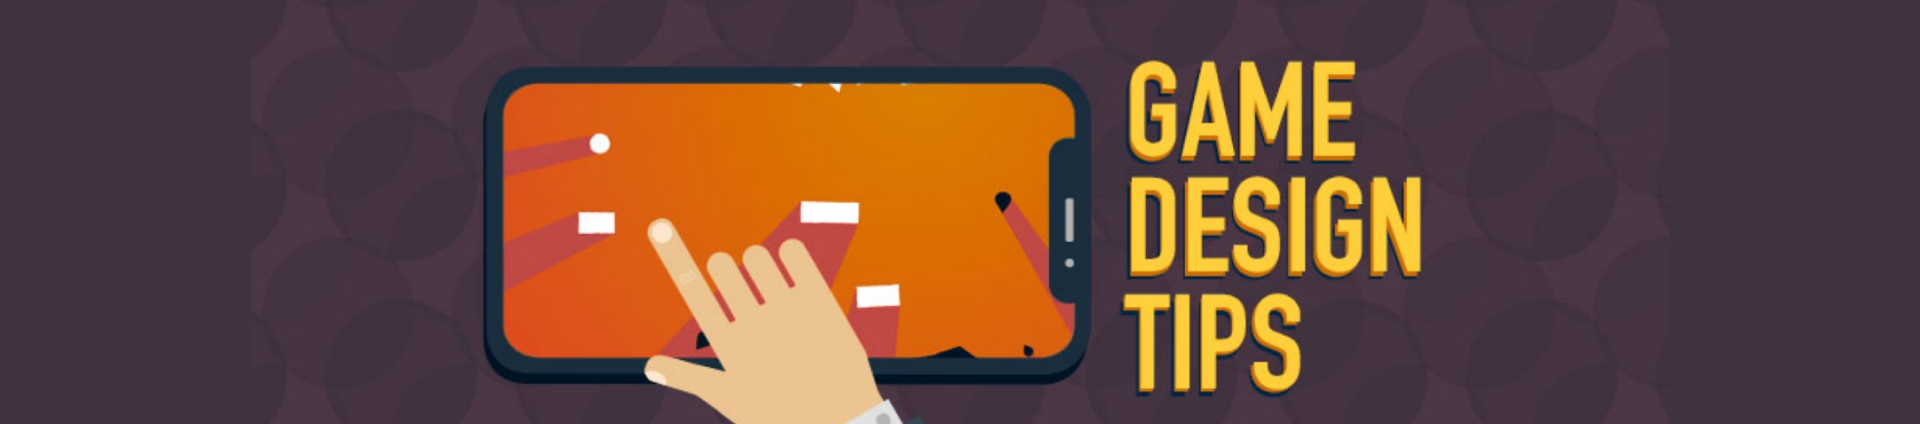 Game Design Tips